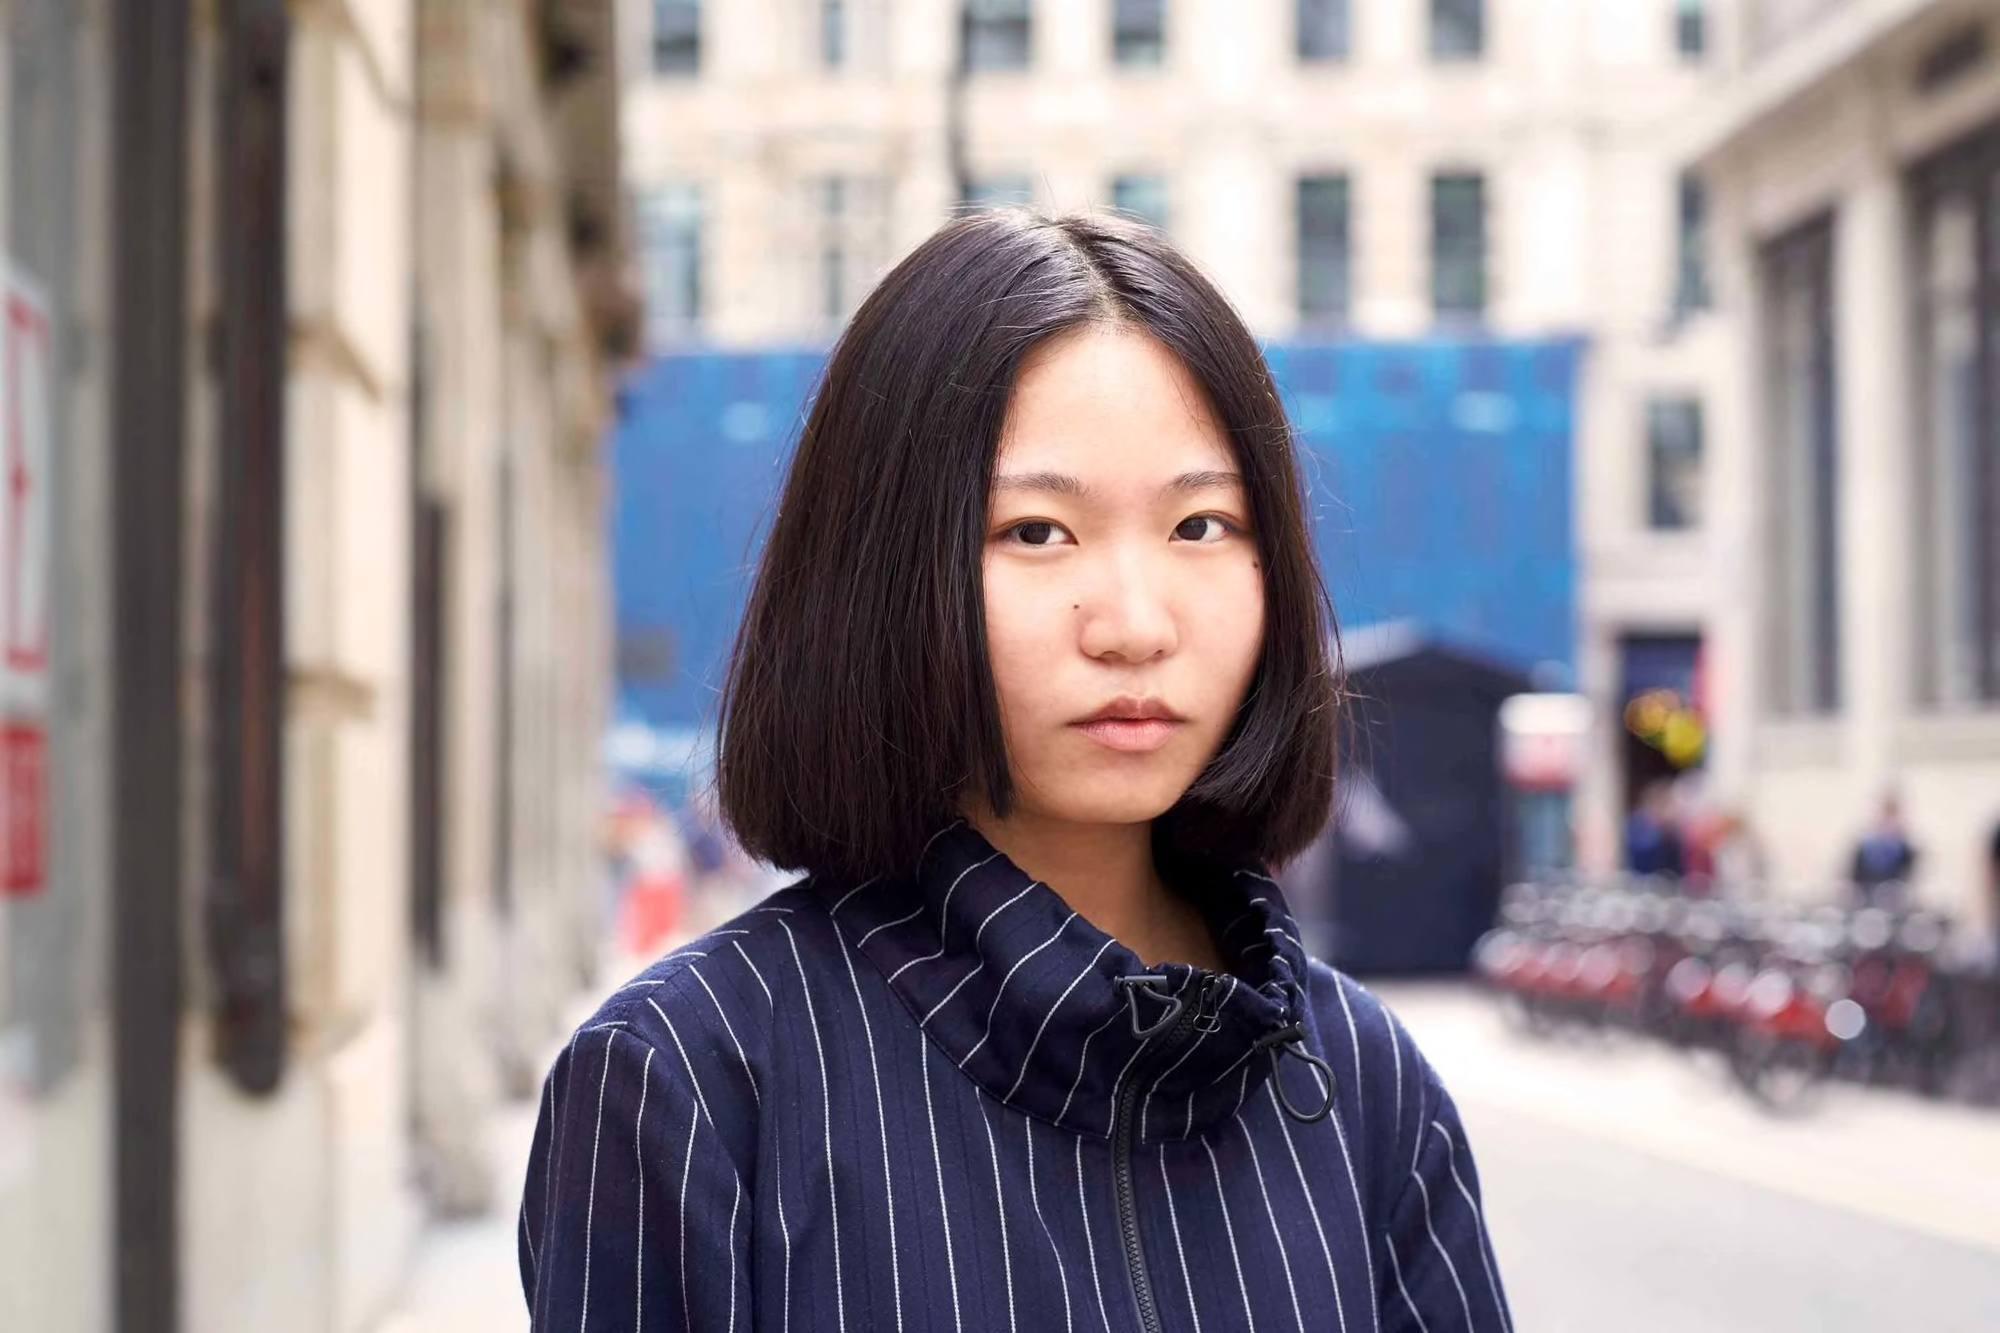 Blunt Haircut 20 Of The Best Modern Ideas To Wear In 2019